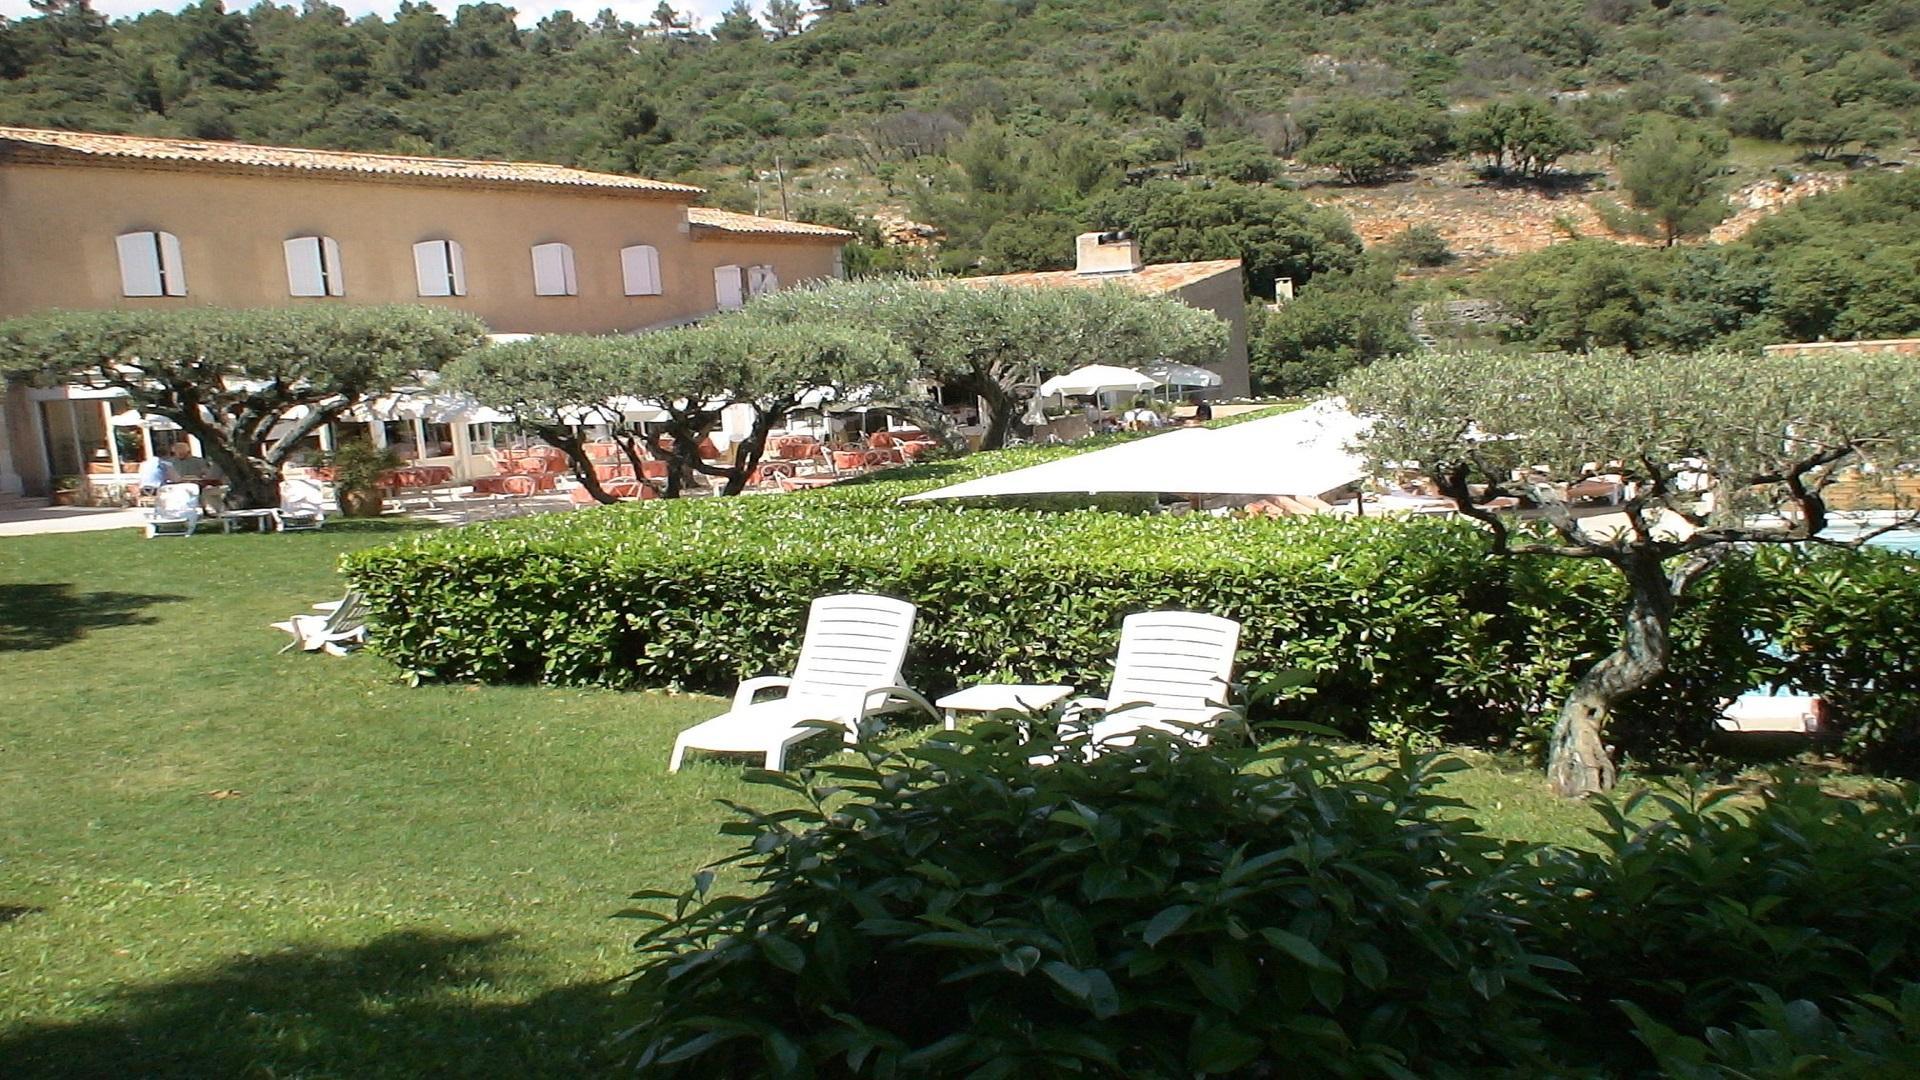 bastide-du-calalou-var-paca-provence-jardin-seminaires-de-caractere